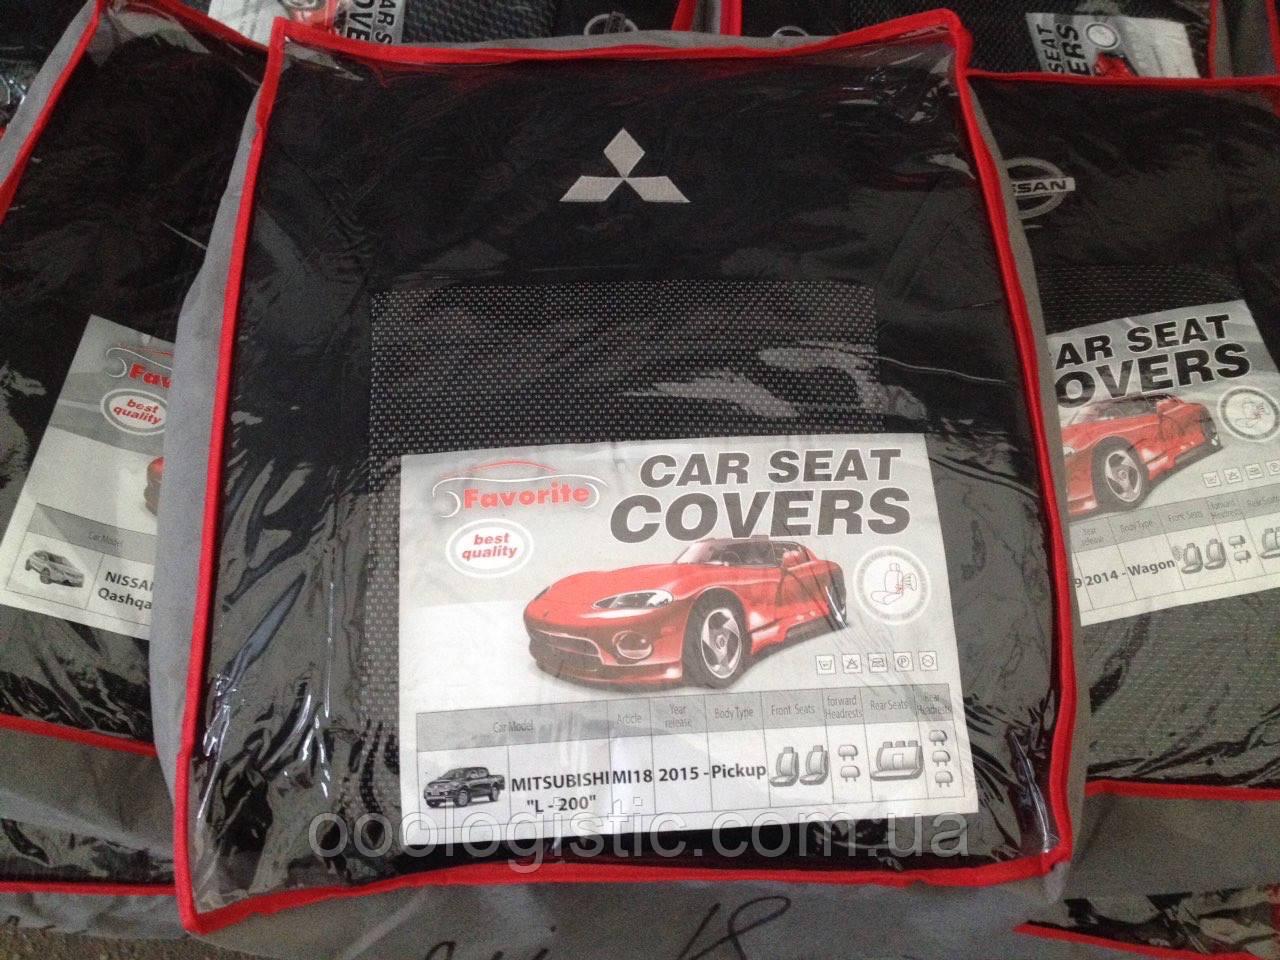 Авточехлы Favorite на Mitsubishi L-200 2015-pickup